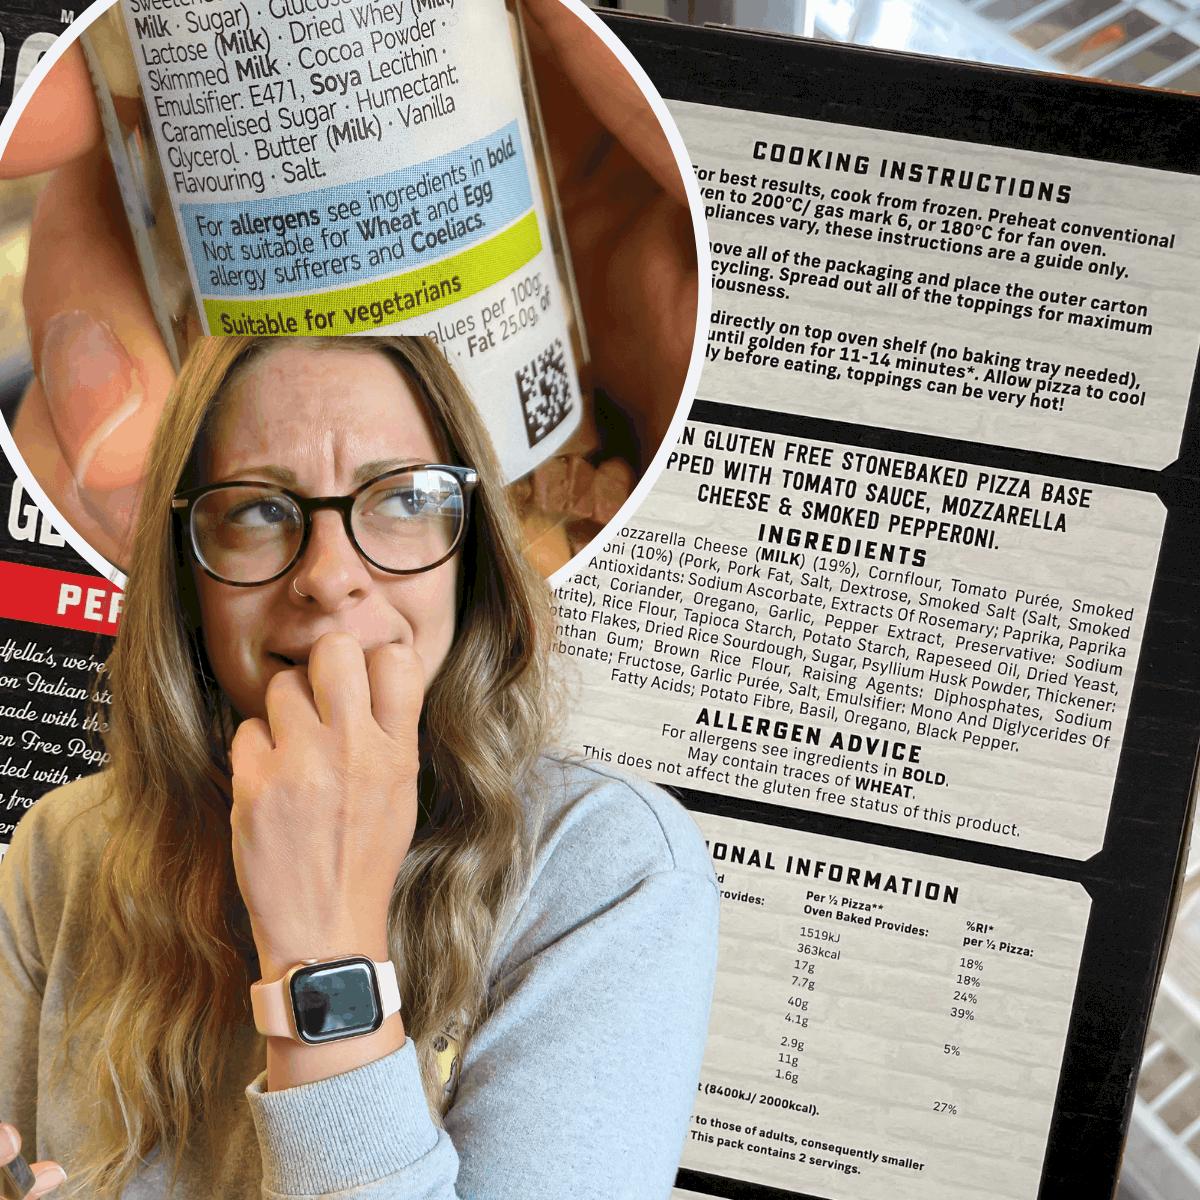 may contain warnings gluten